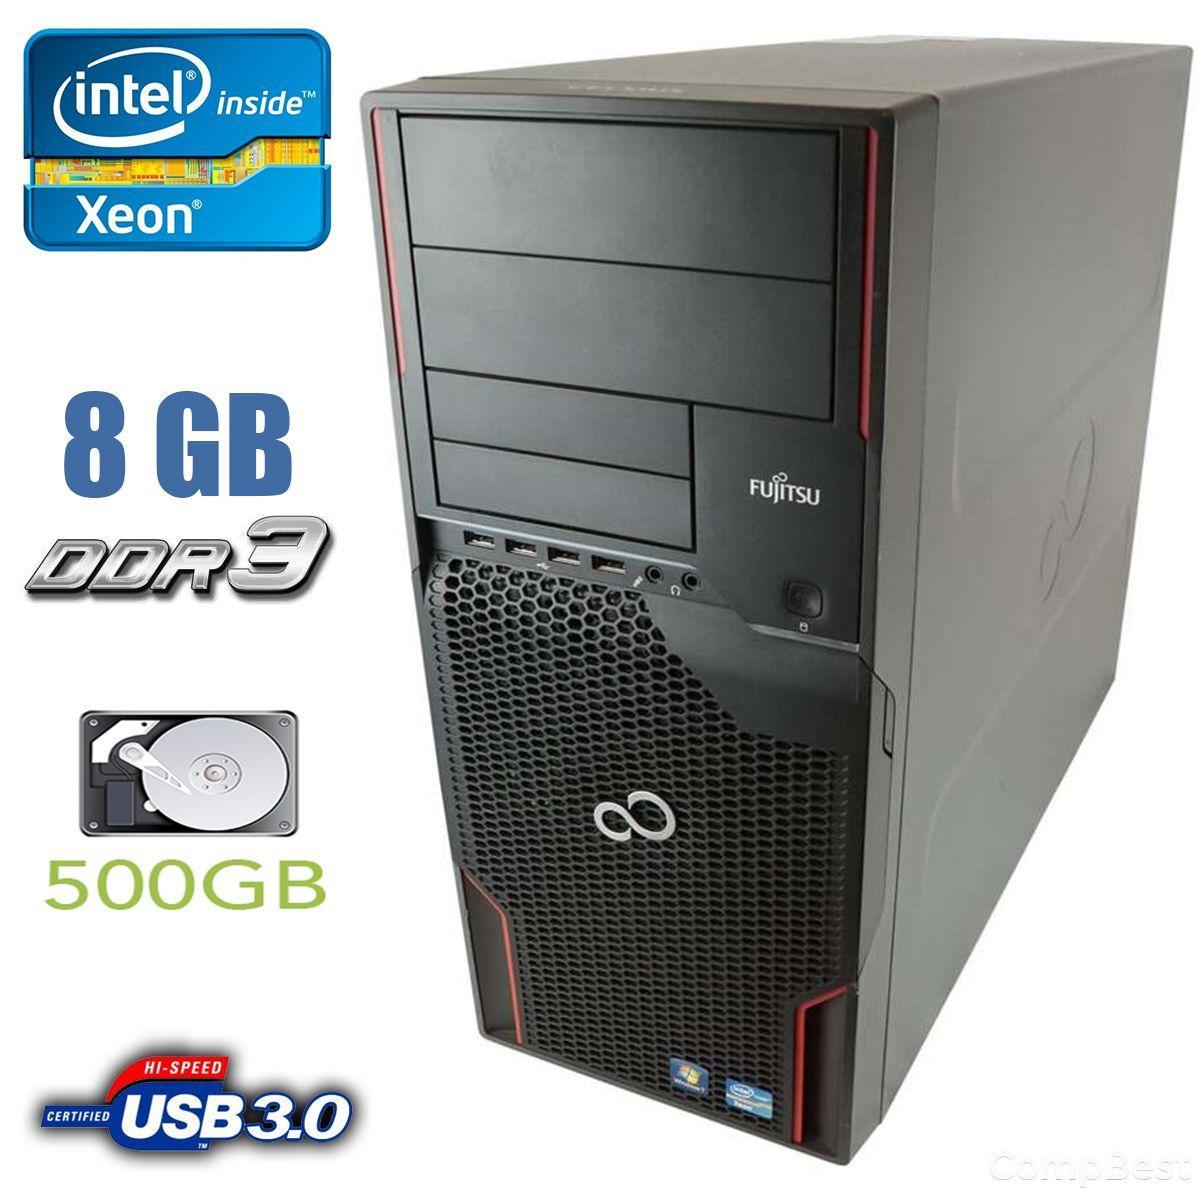 Fujitsu Celsius M720 / Intel Xeon E5-1620 (4 (8) ядер по 3.6 - 3.8 GHz) / 8 GB DDR3 / 500 GB HDD / nVidia Quadro / USB 3.0